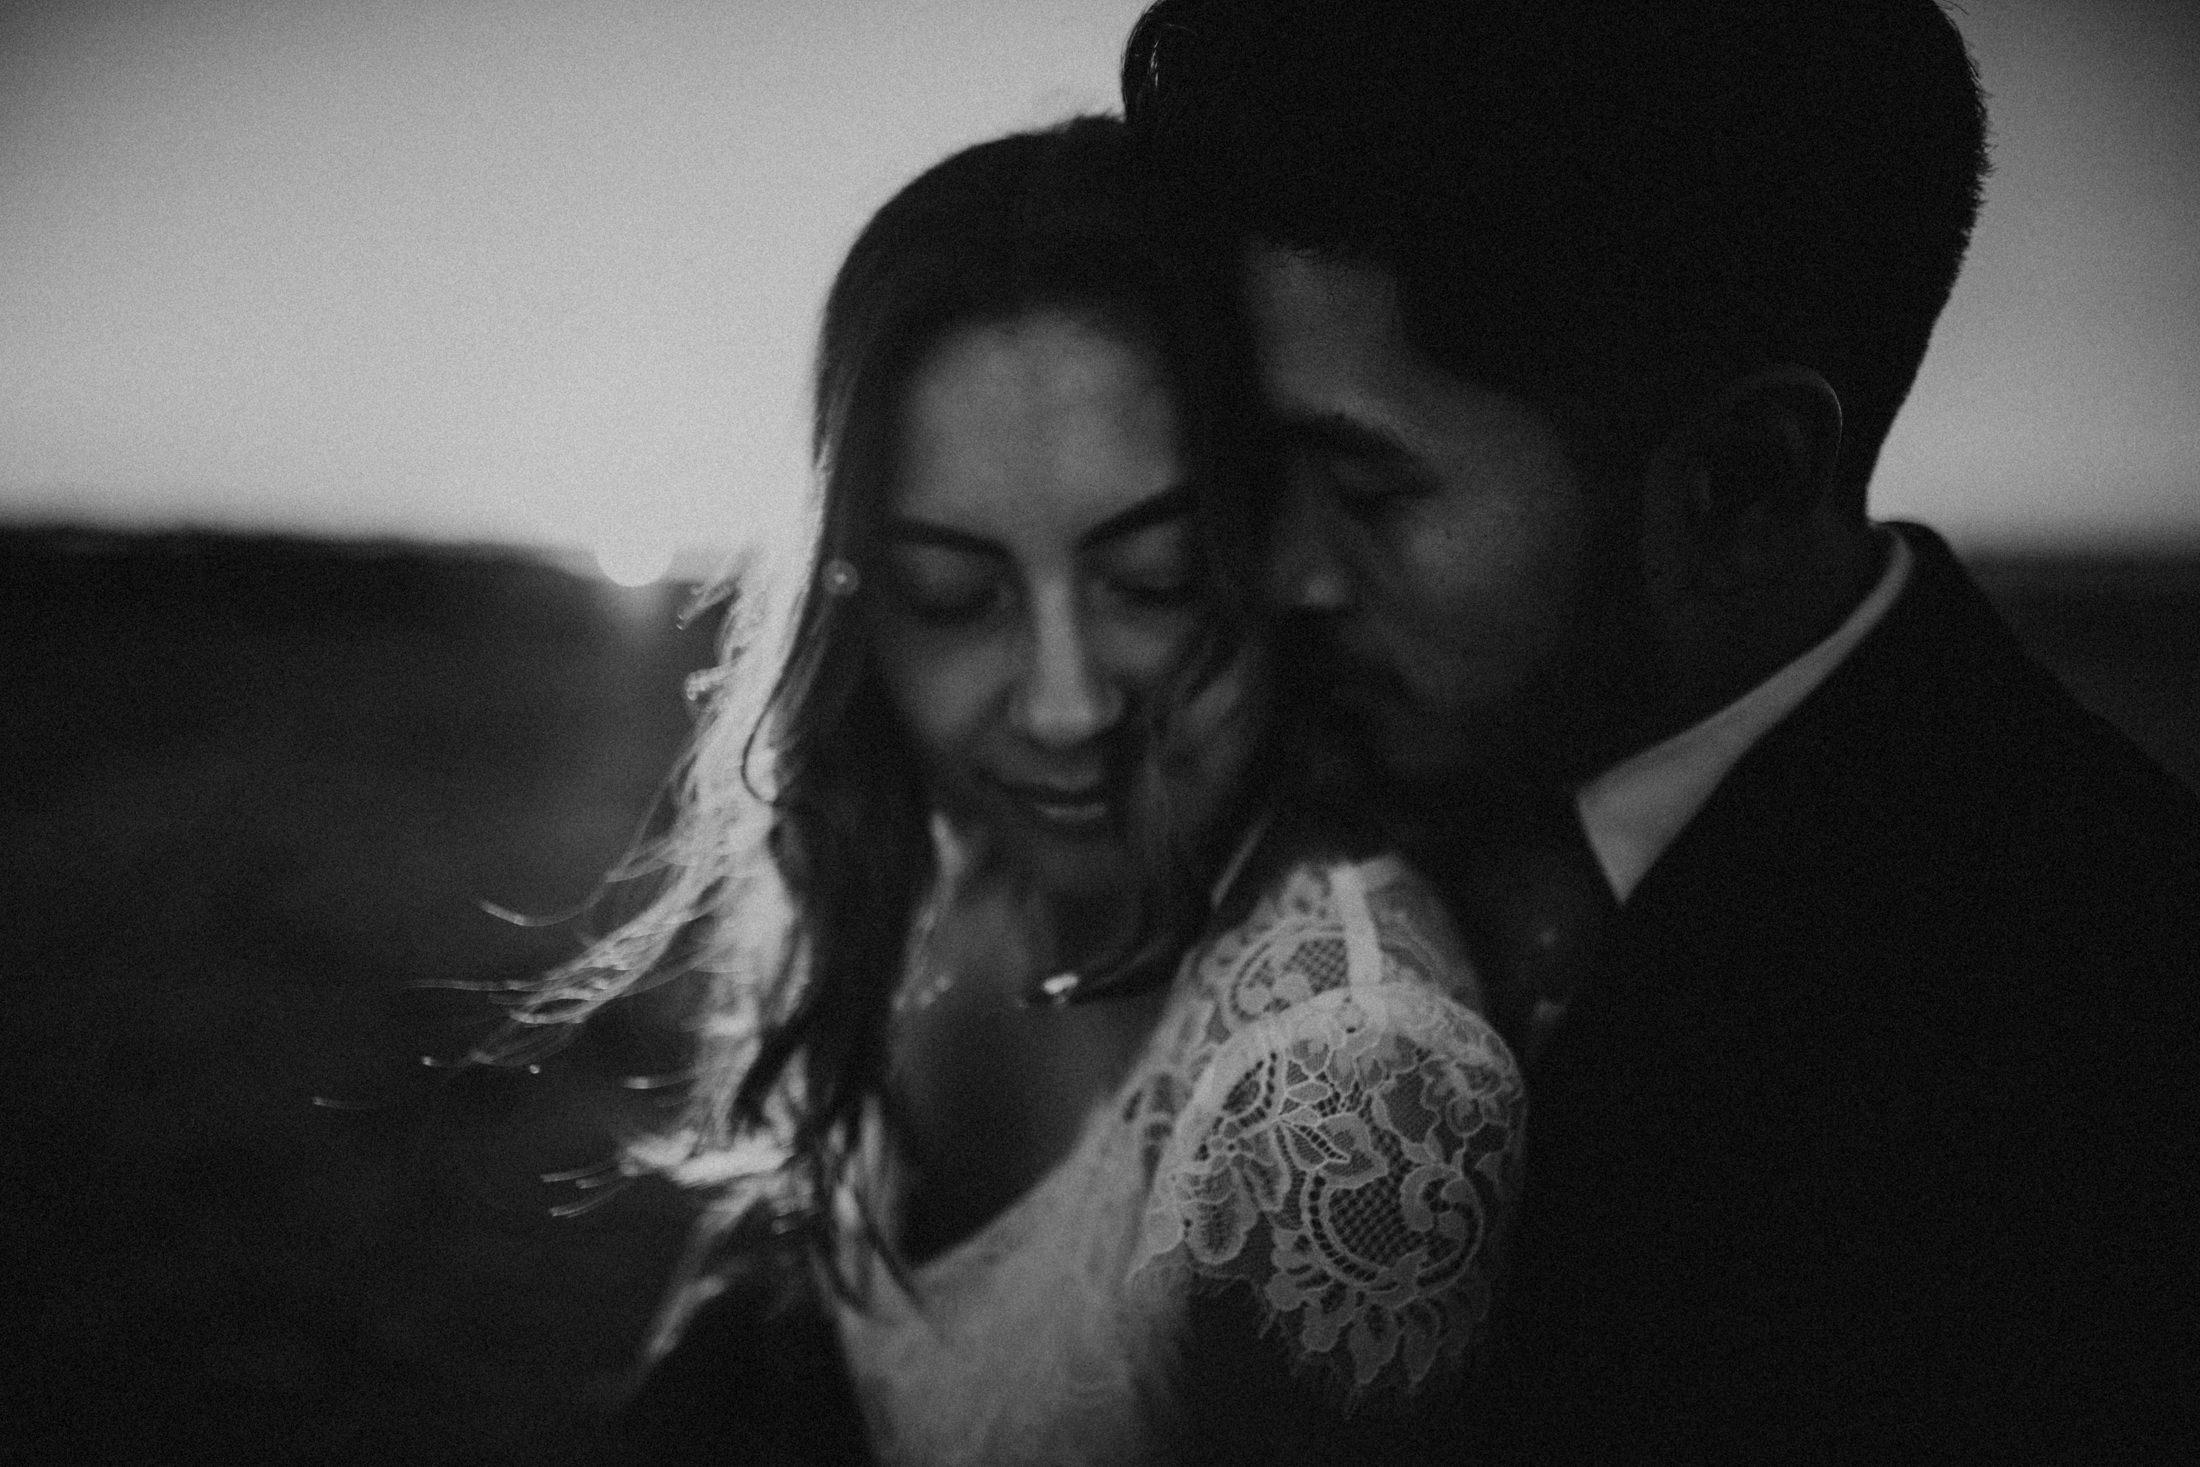 Wedding_Photographer_Mallorca_Daniela-Marquardt_Photography_CanaryIslands_Lanzarote_Iceland_Tuskany_Santorini_Portugal_Schweiz_Austria_Bayern_Elopement_Hochzeitsfotograf_Norddeichich_73